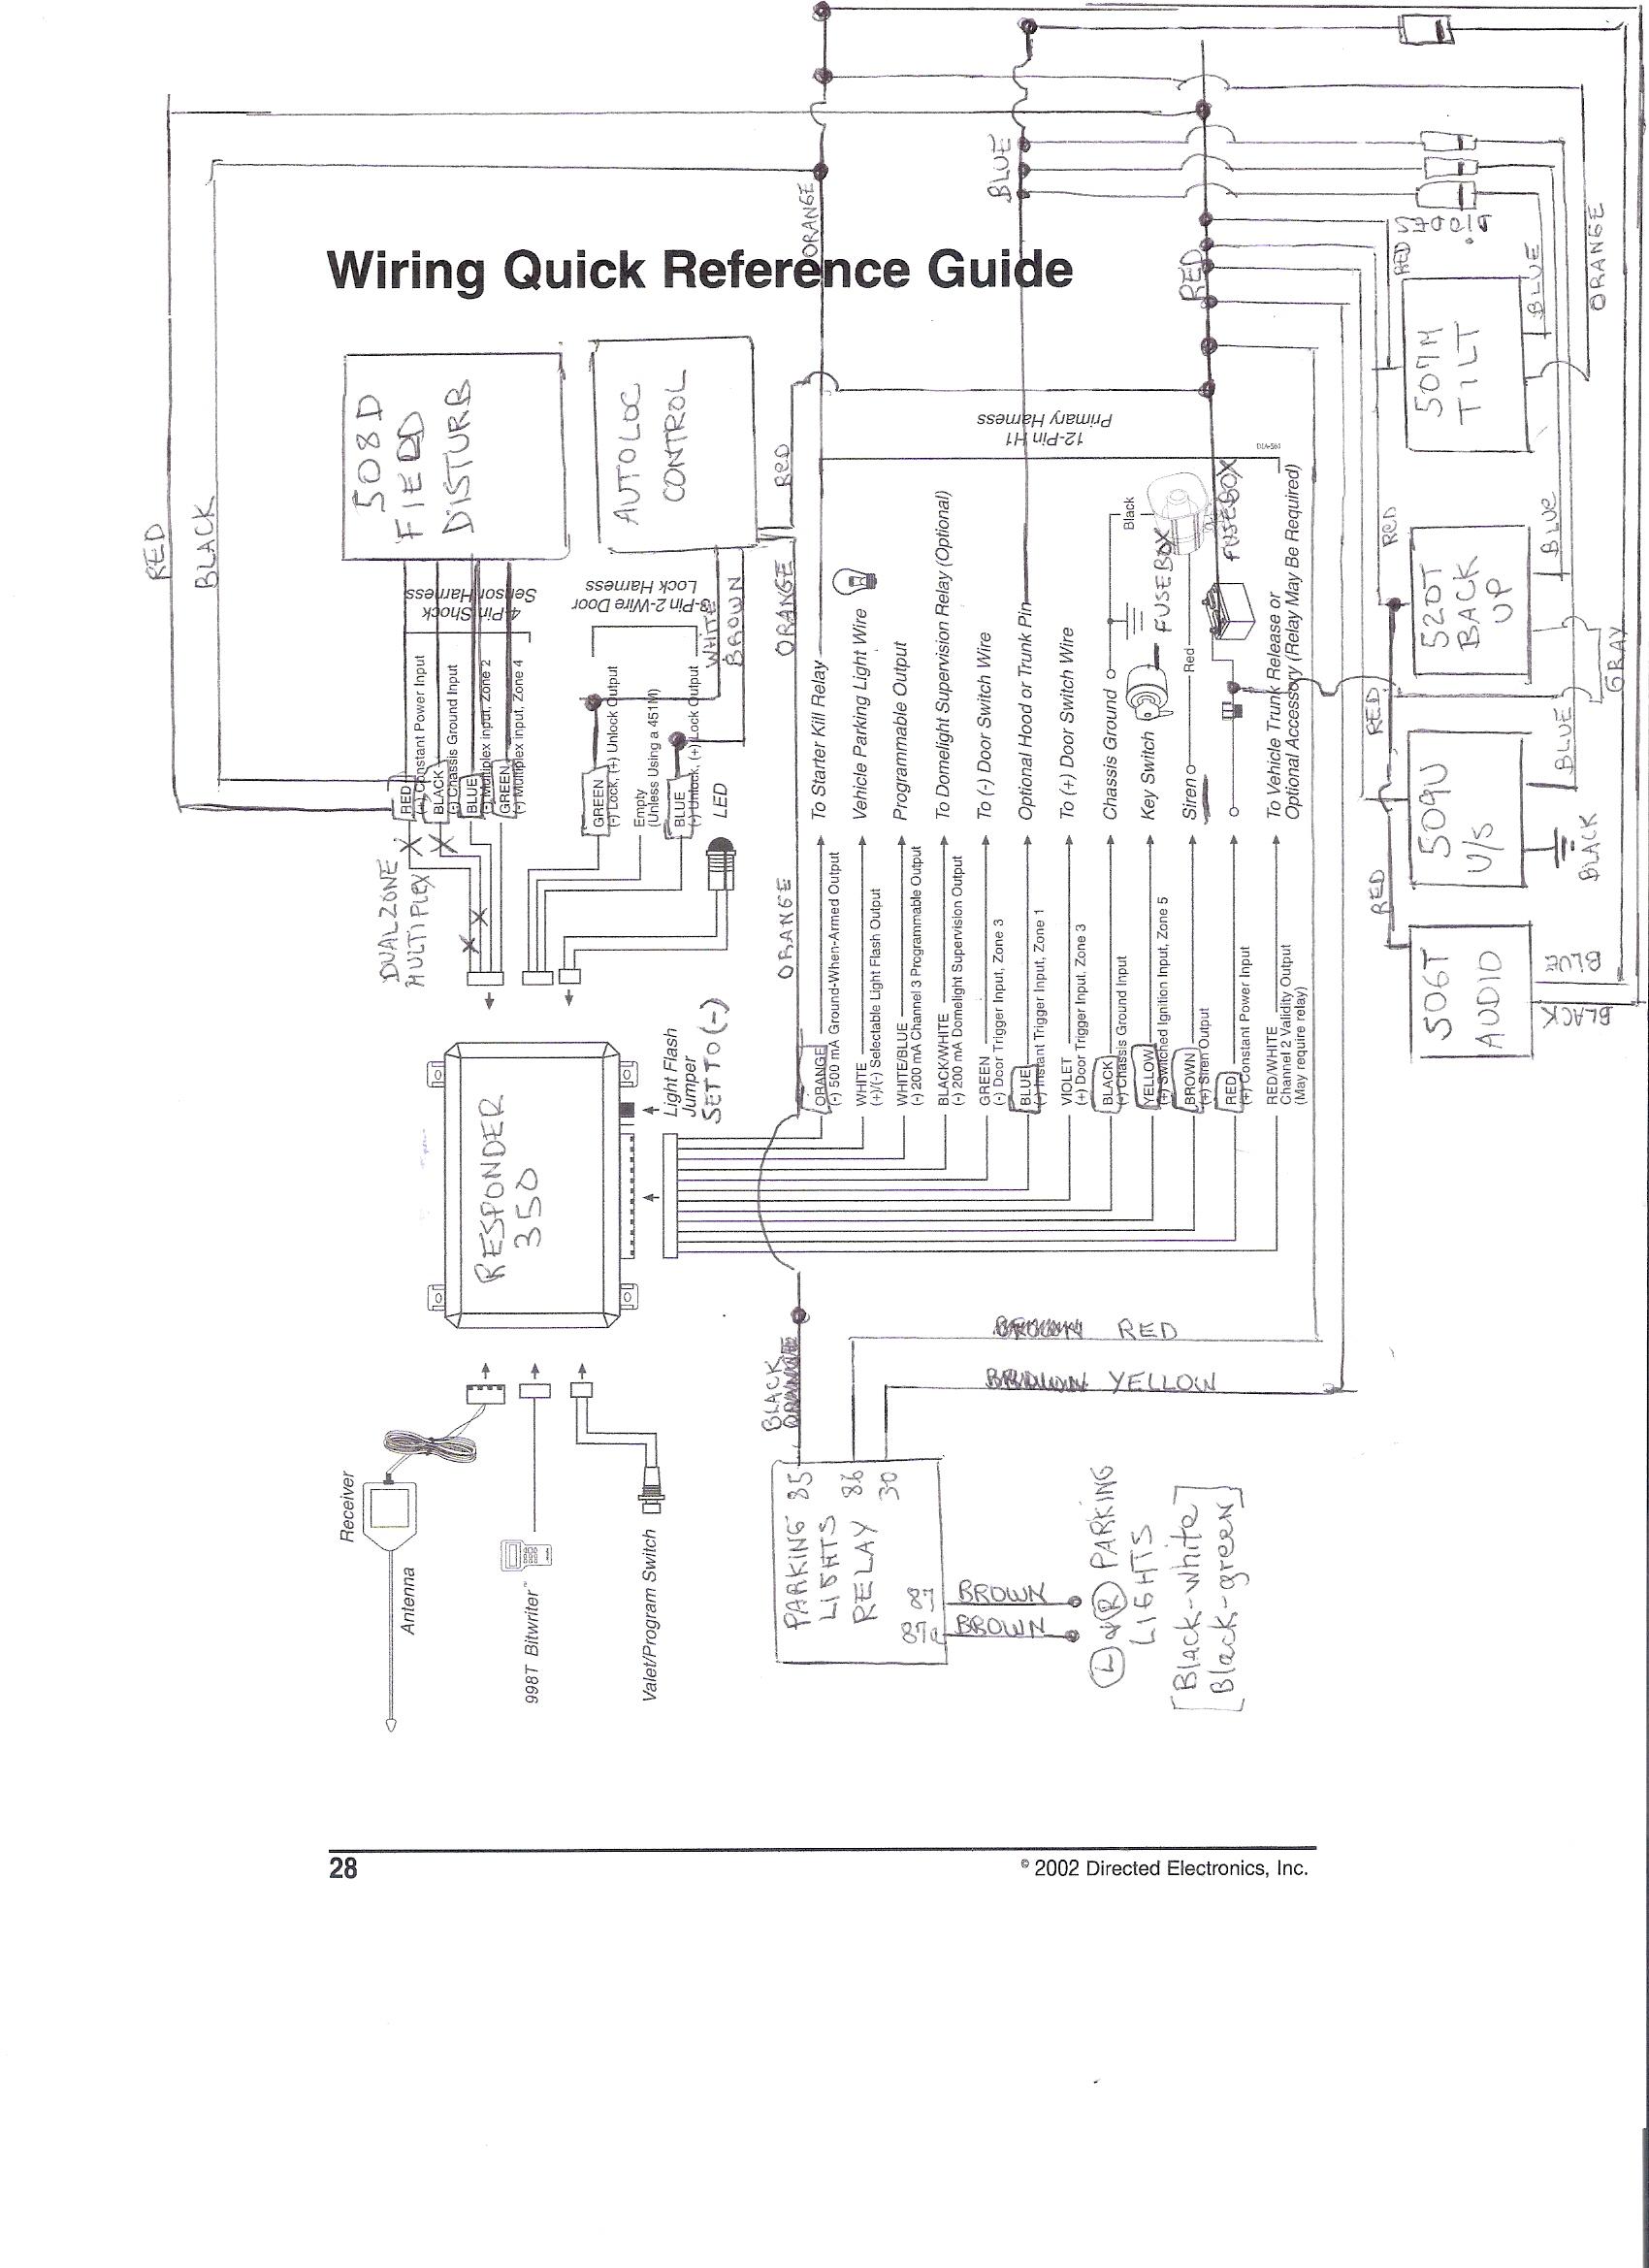 Autoloc Wiring Diagrams Svpro5 Diagram Library Power Window Single Todaysautoloc Simple